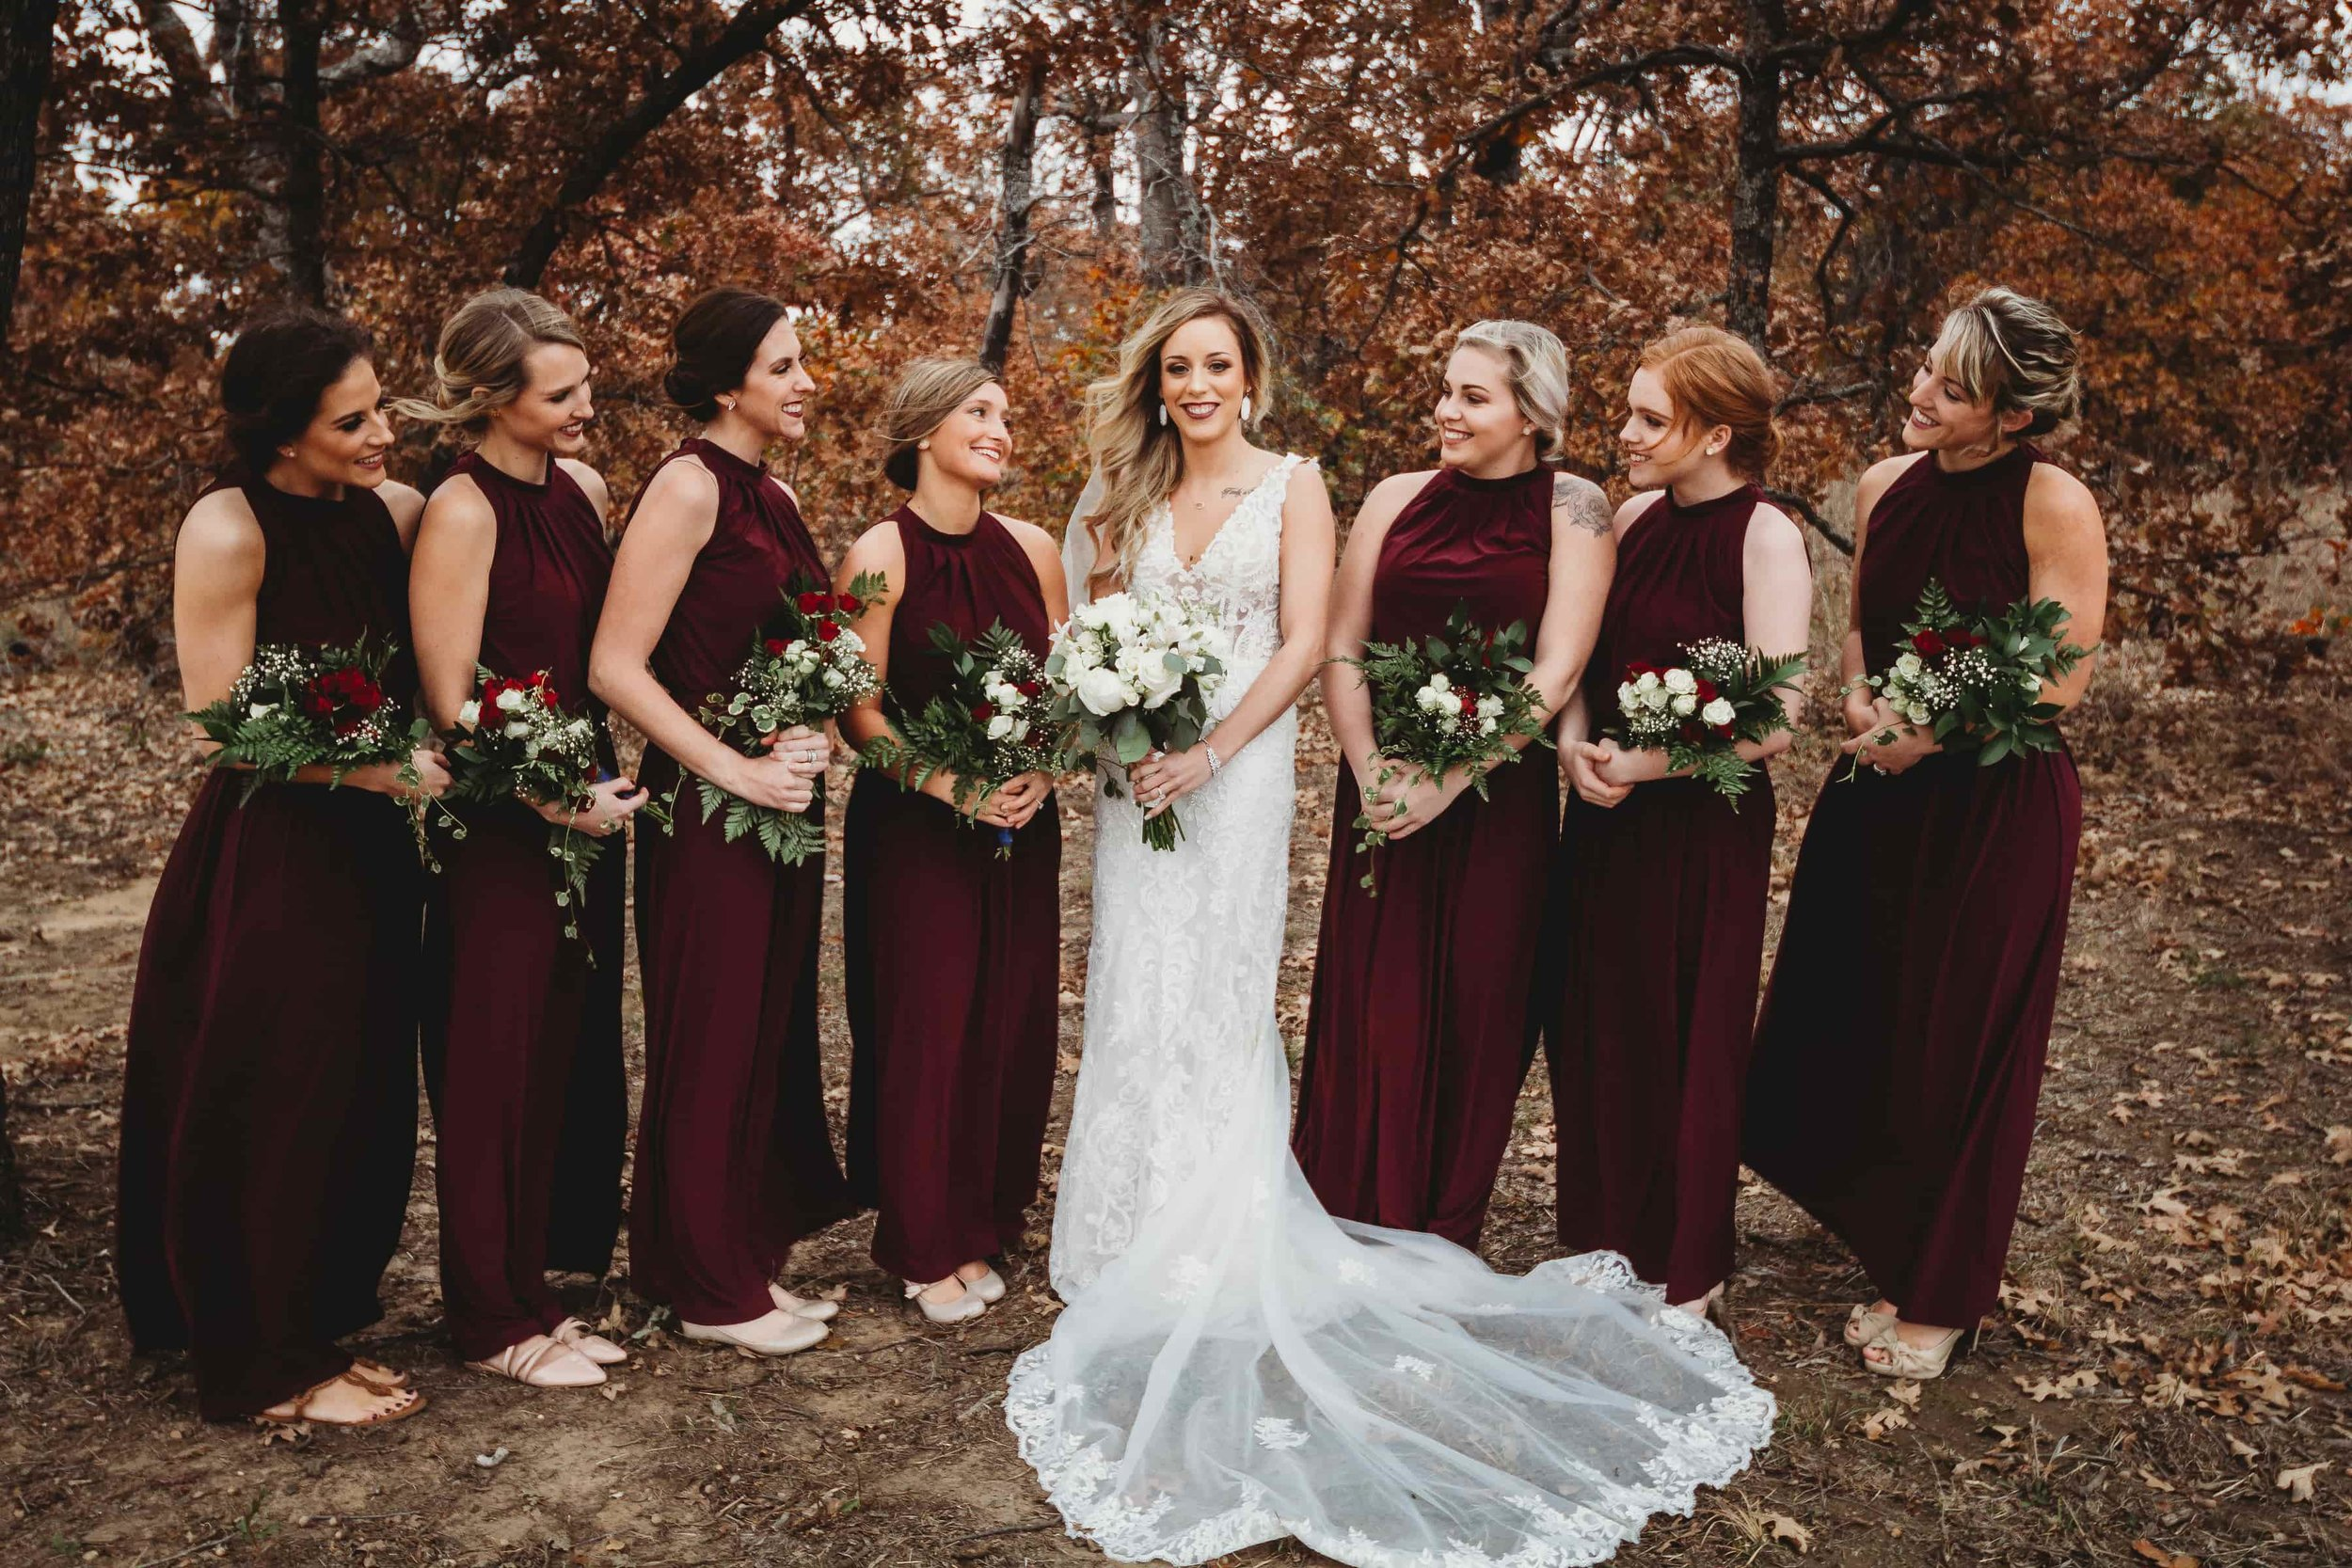 Outdoor Wedding Venue Tulsa 3-min.jpg